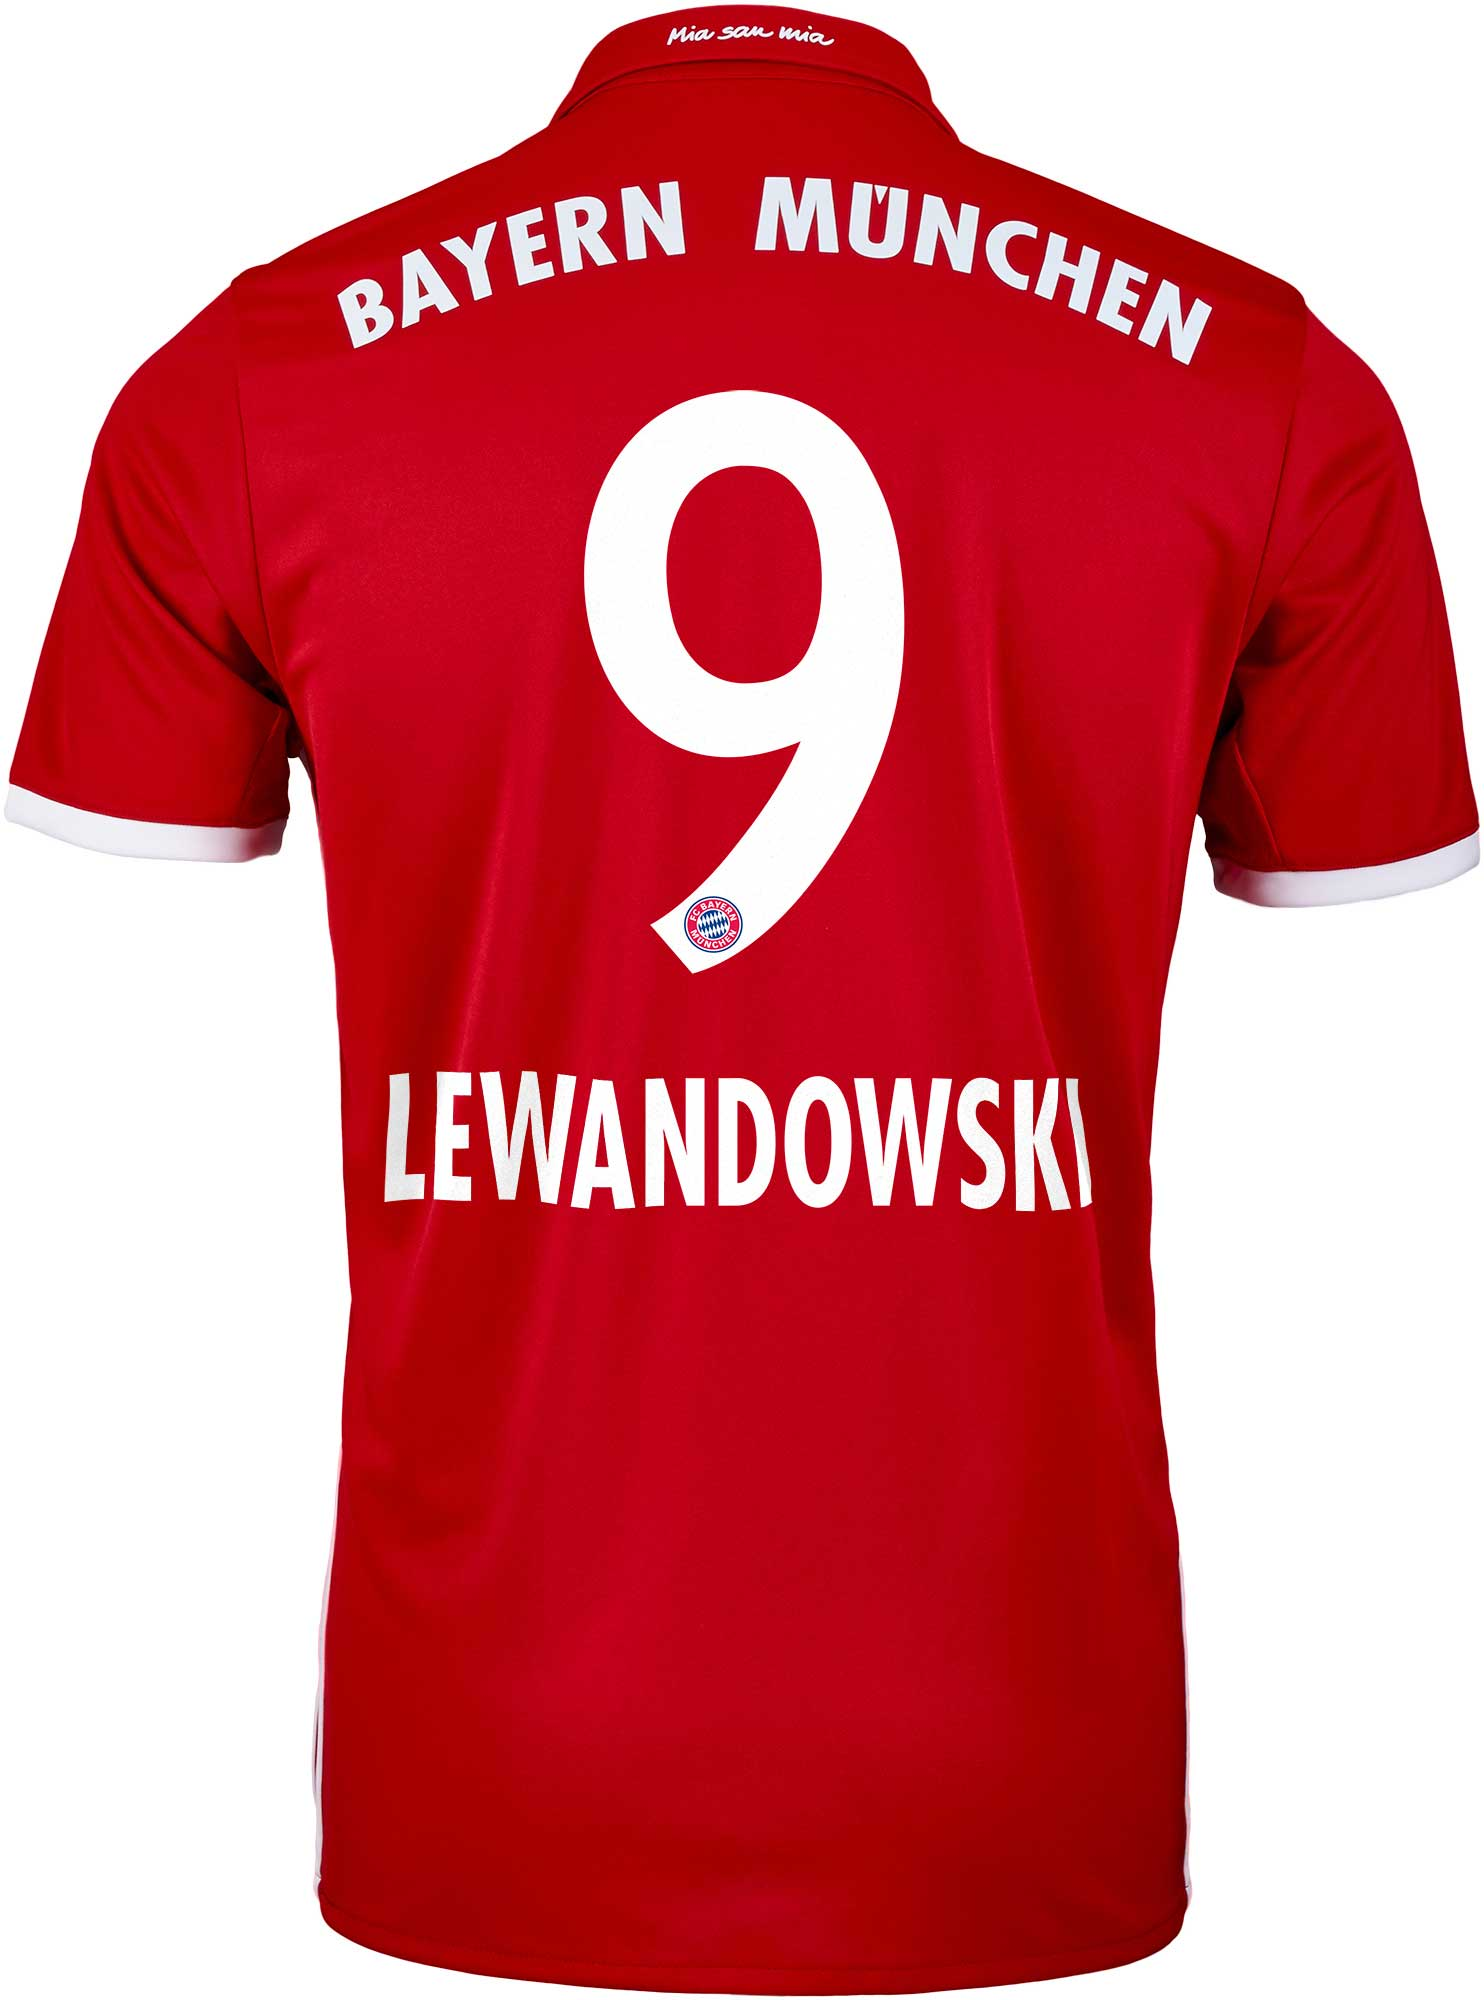 on sale d49fb 24ed7 adidas Lewandowski Bayern Munich Jersey - 2016 Bayern Munich ...